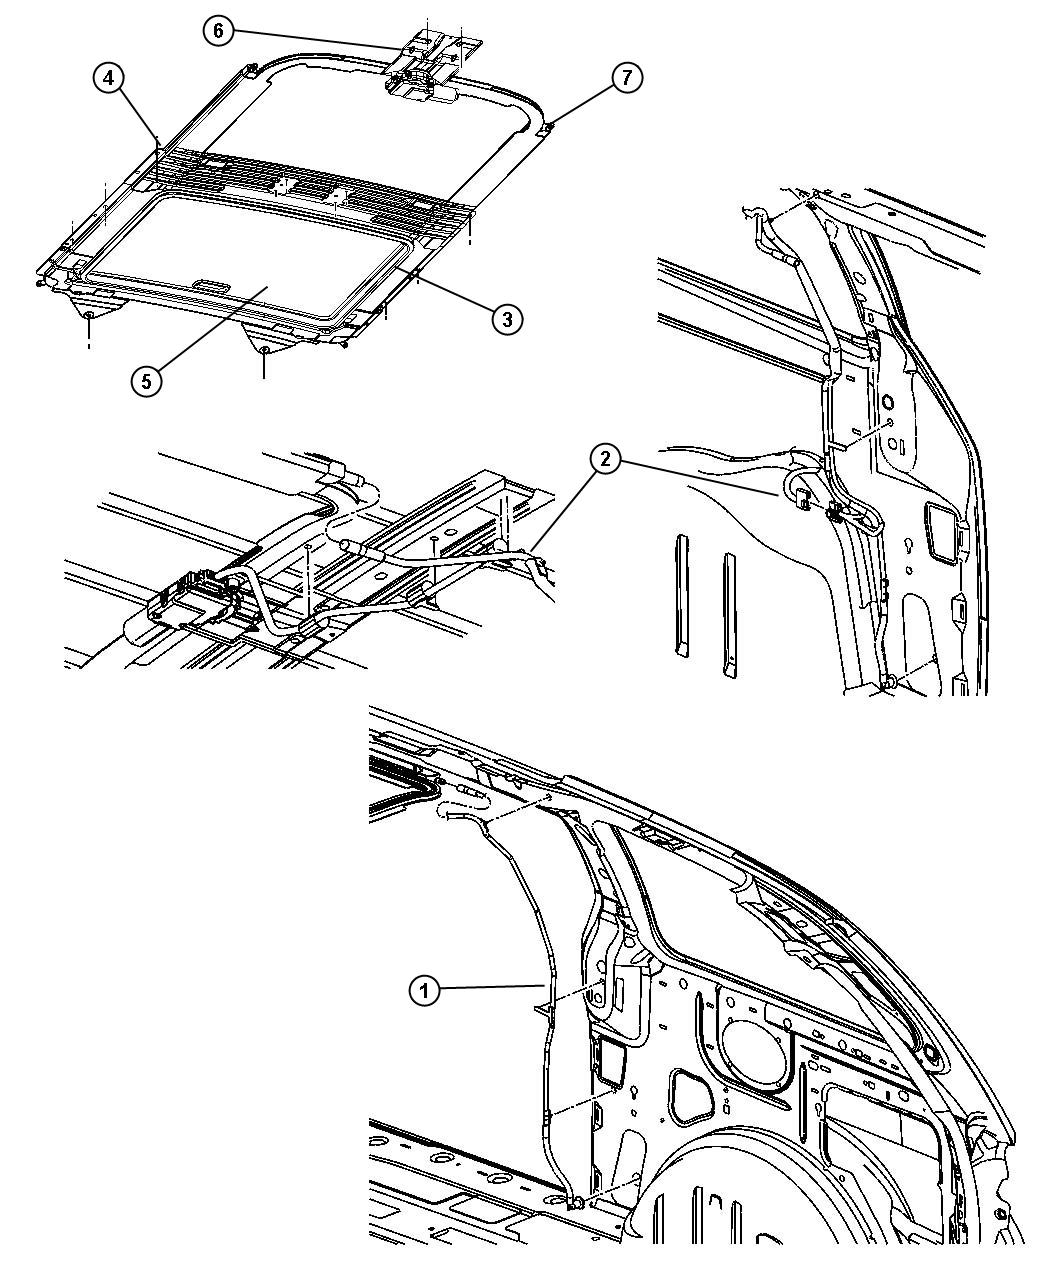 Dodge Grand Caravan Trim lace. Sunroof. Trim: [all trim